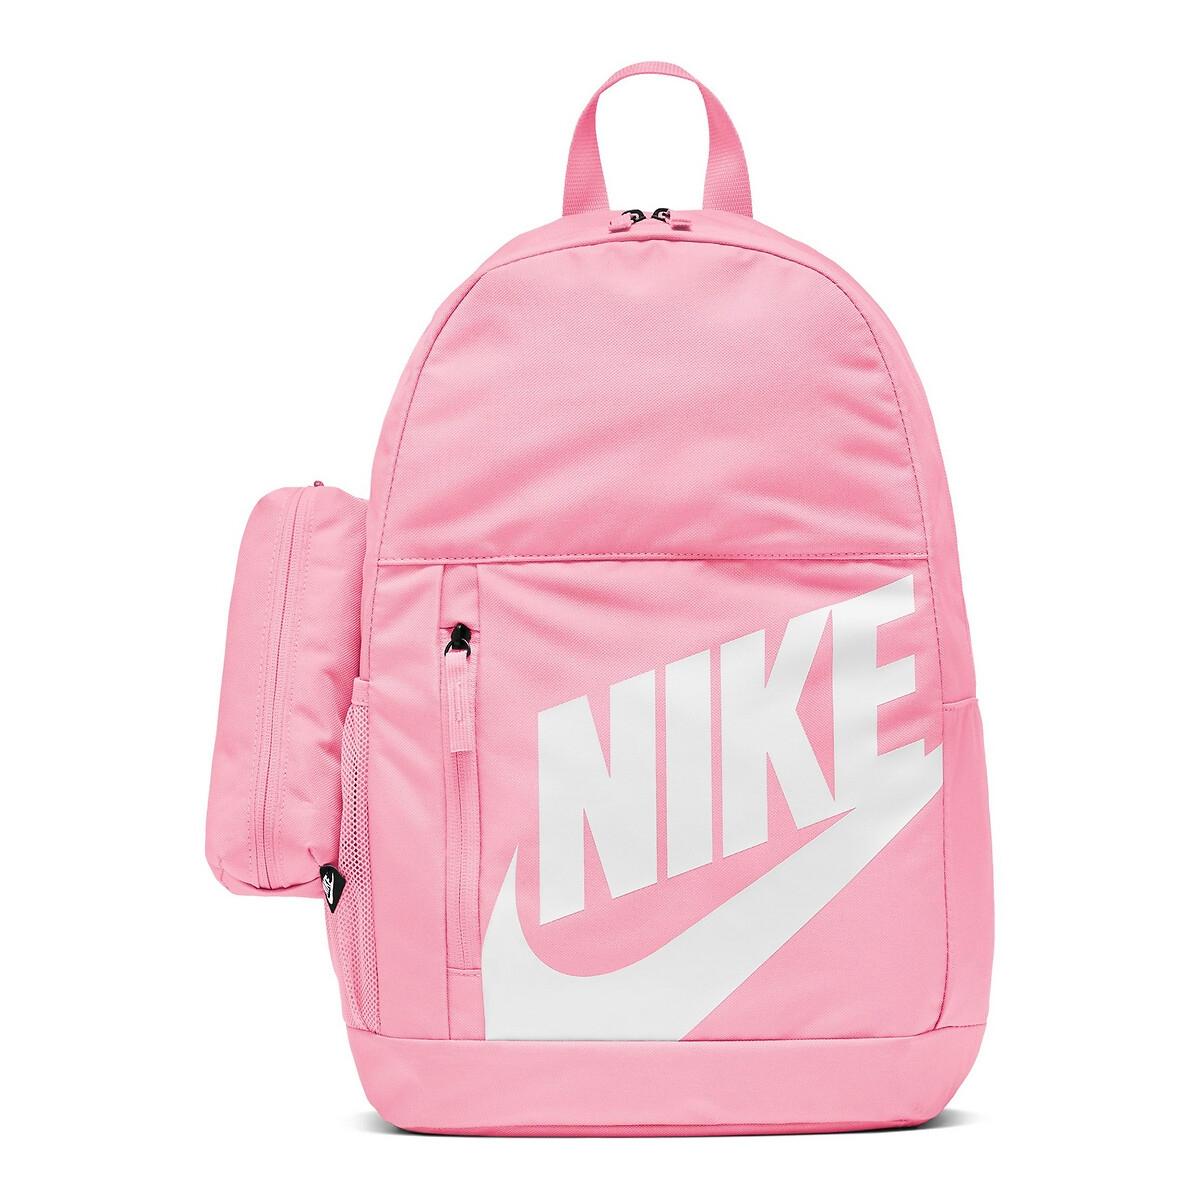 An image of Nike Girls Elemental Backpack